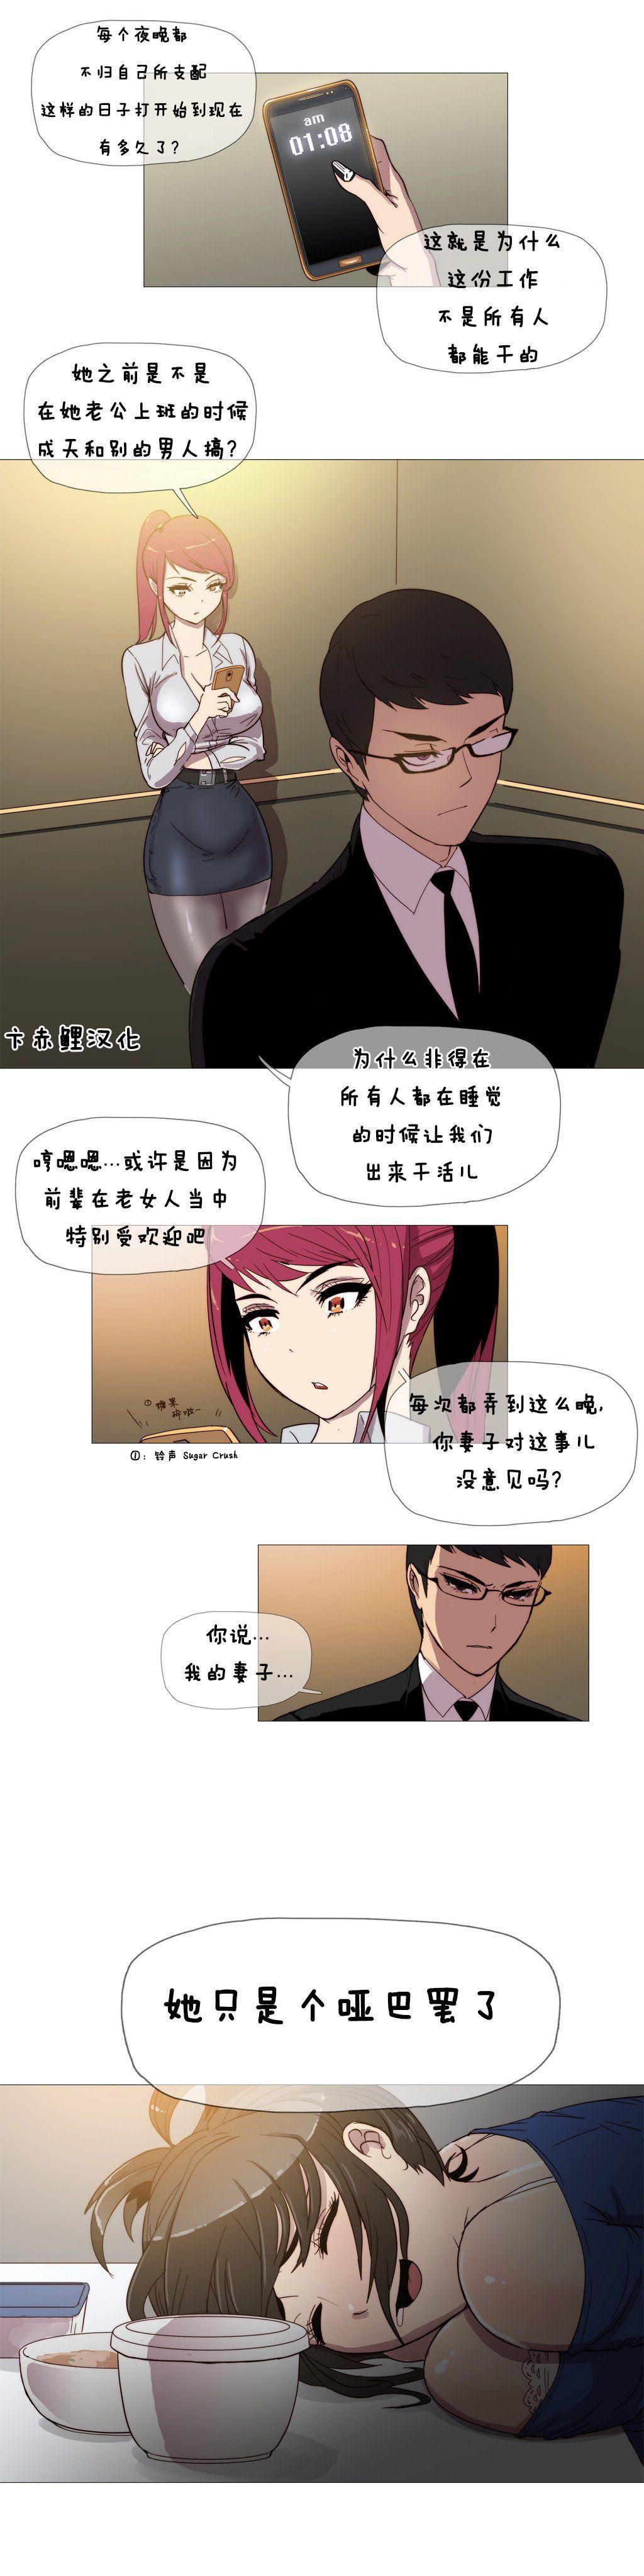 HouseHold Affairs 【卞赤鲤个人汉化】1~21话(持续更新中) 44